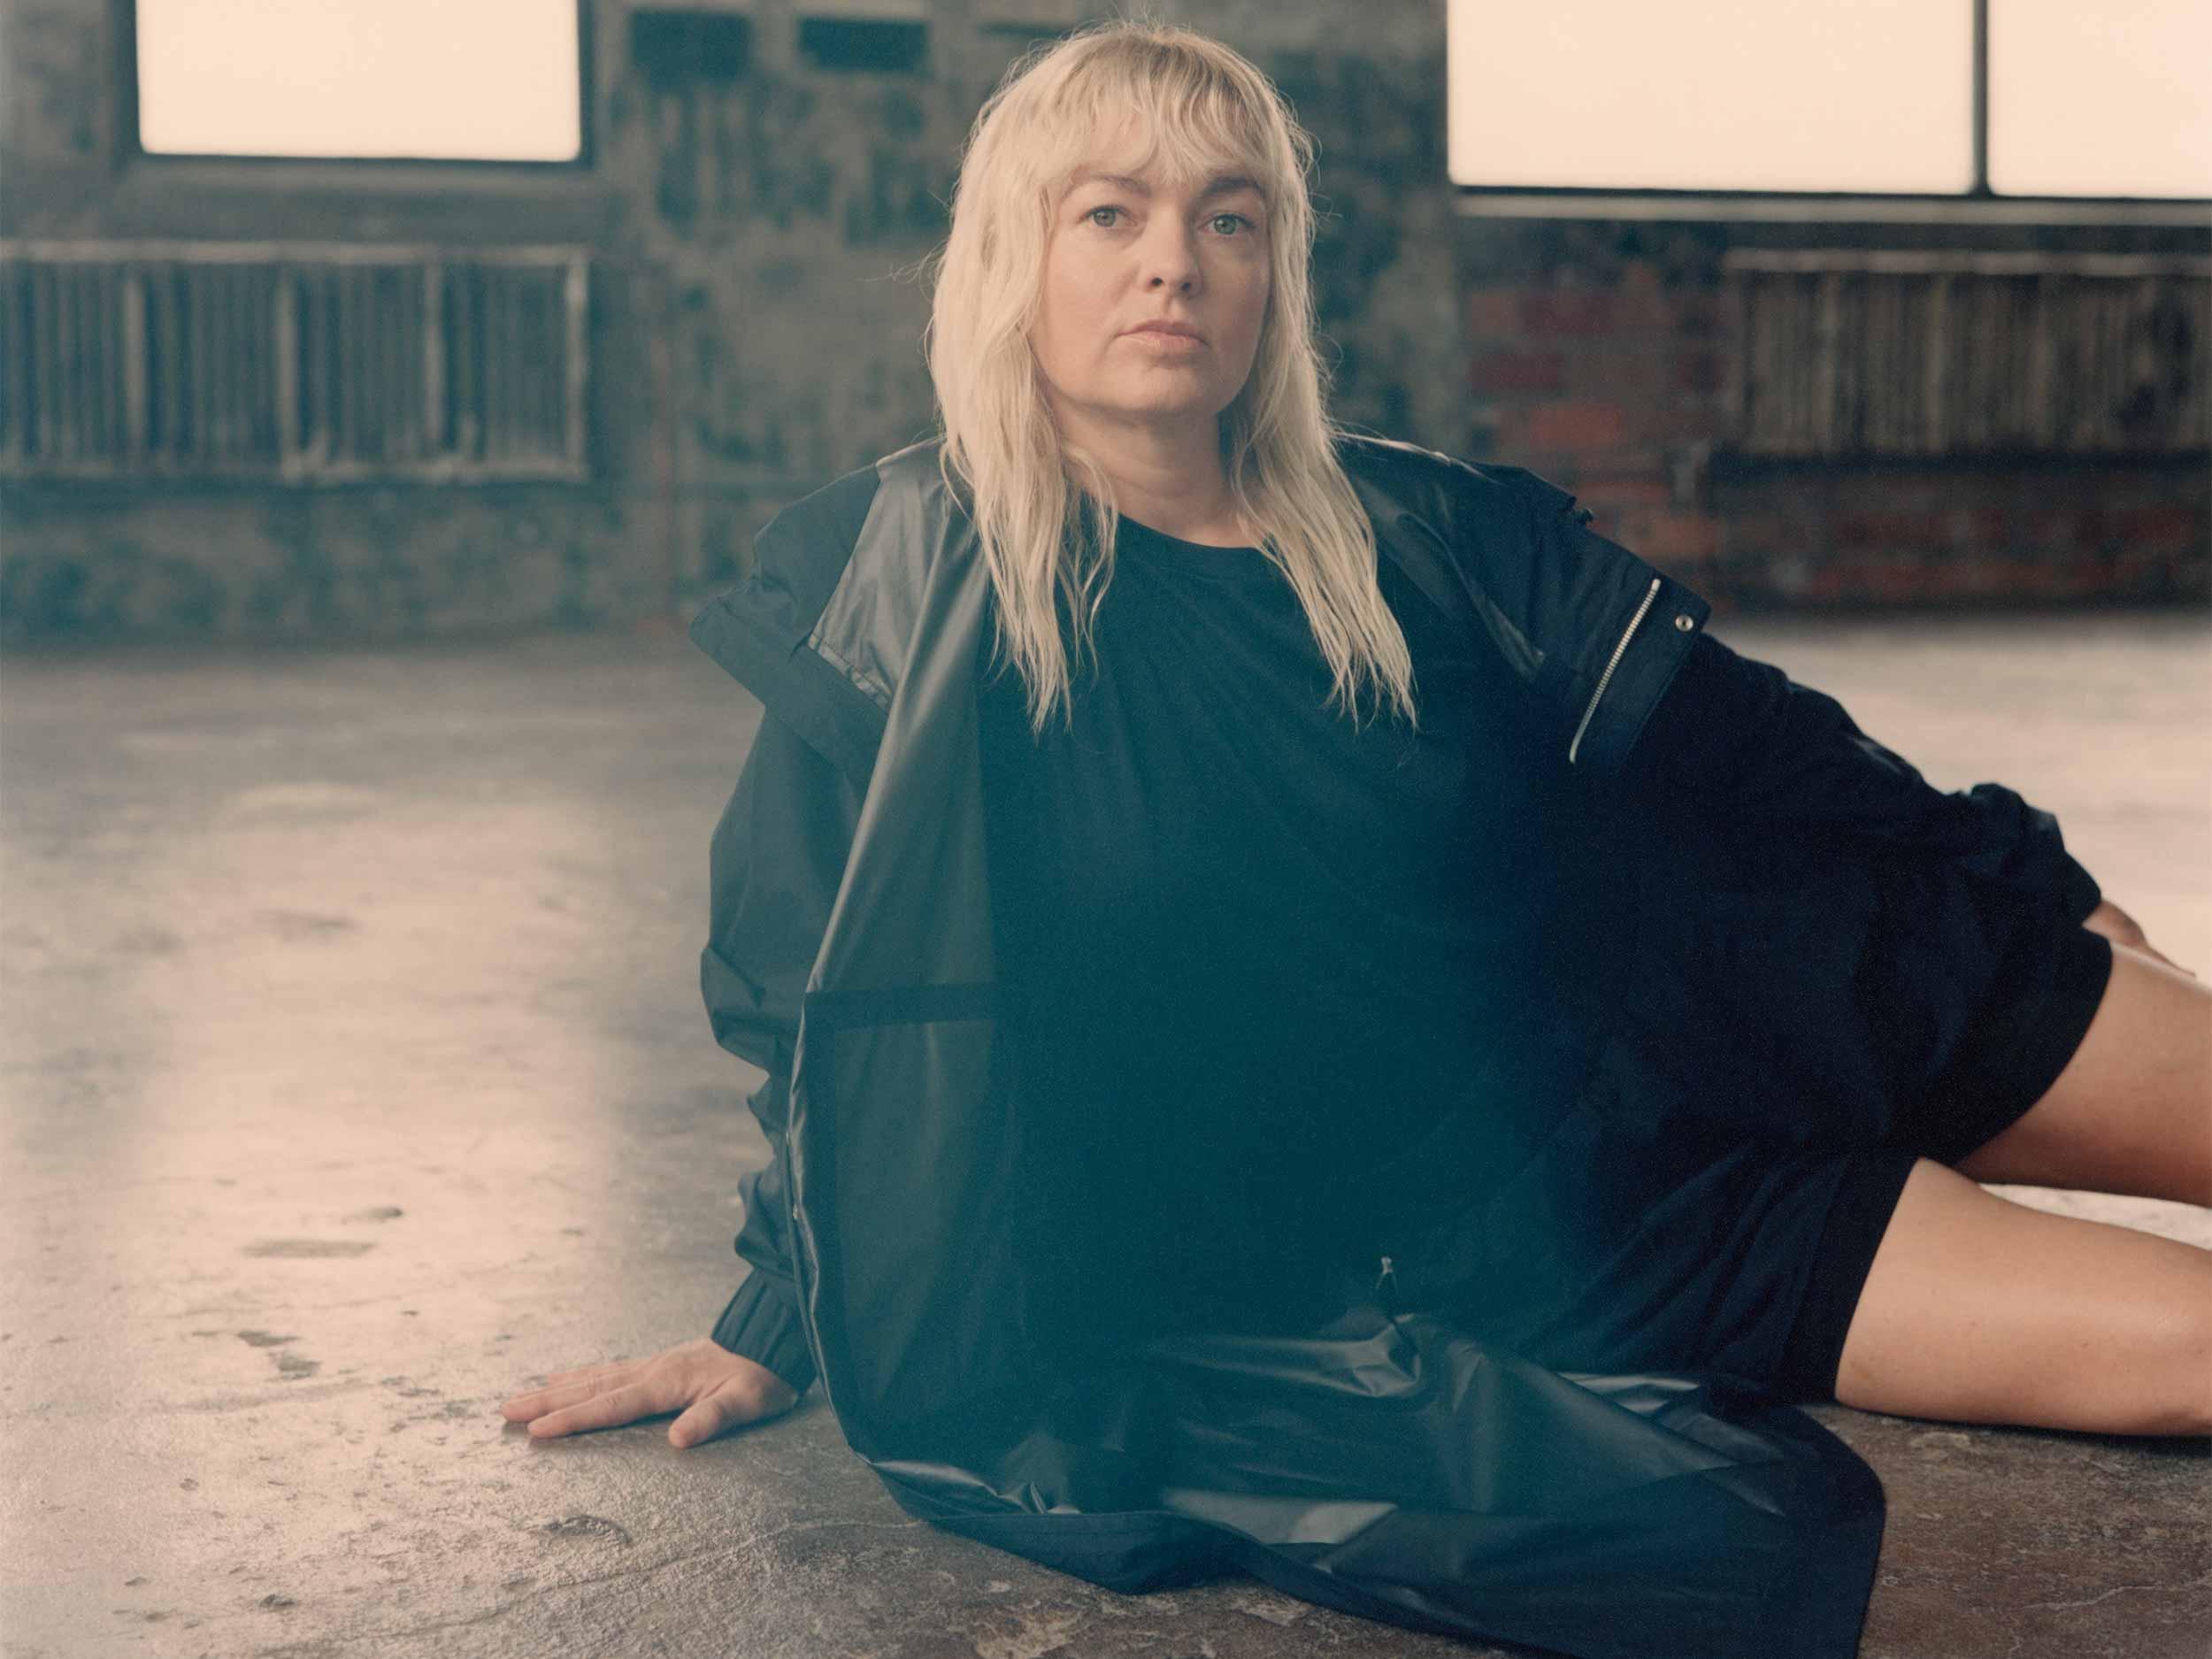 Phoebe Berglund revives the communal spirit of dance